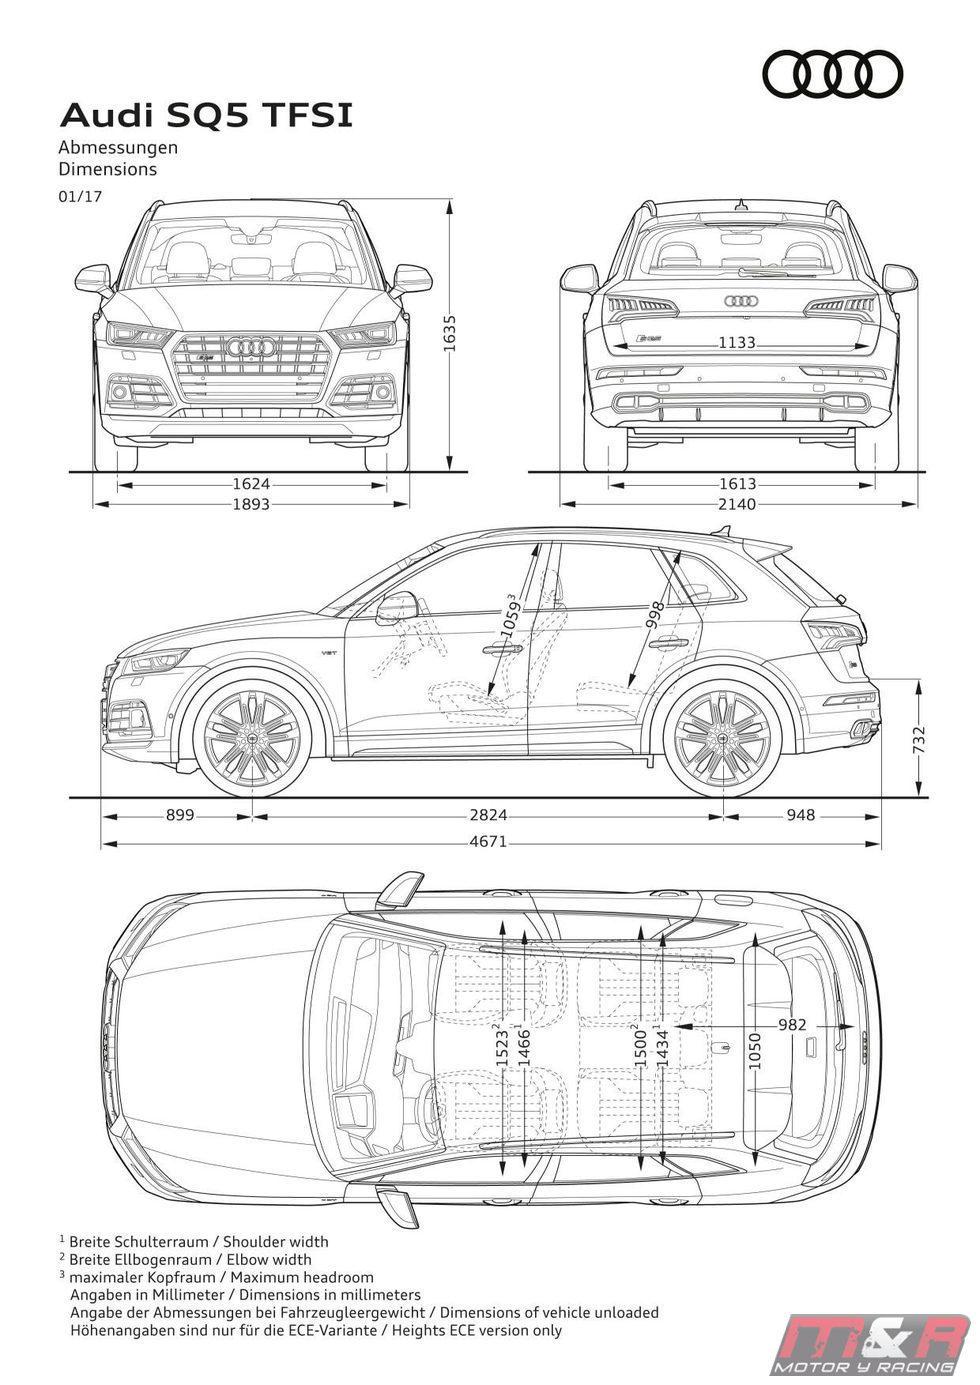 Audi SQ5 TFSI 2017 - Especificaciones